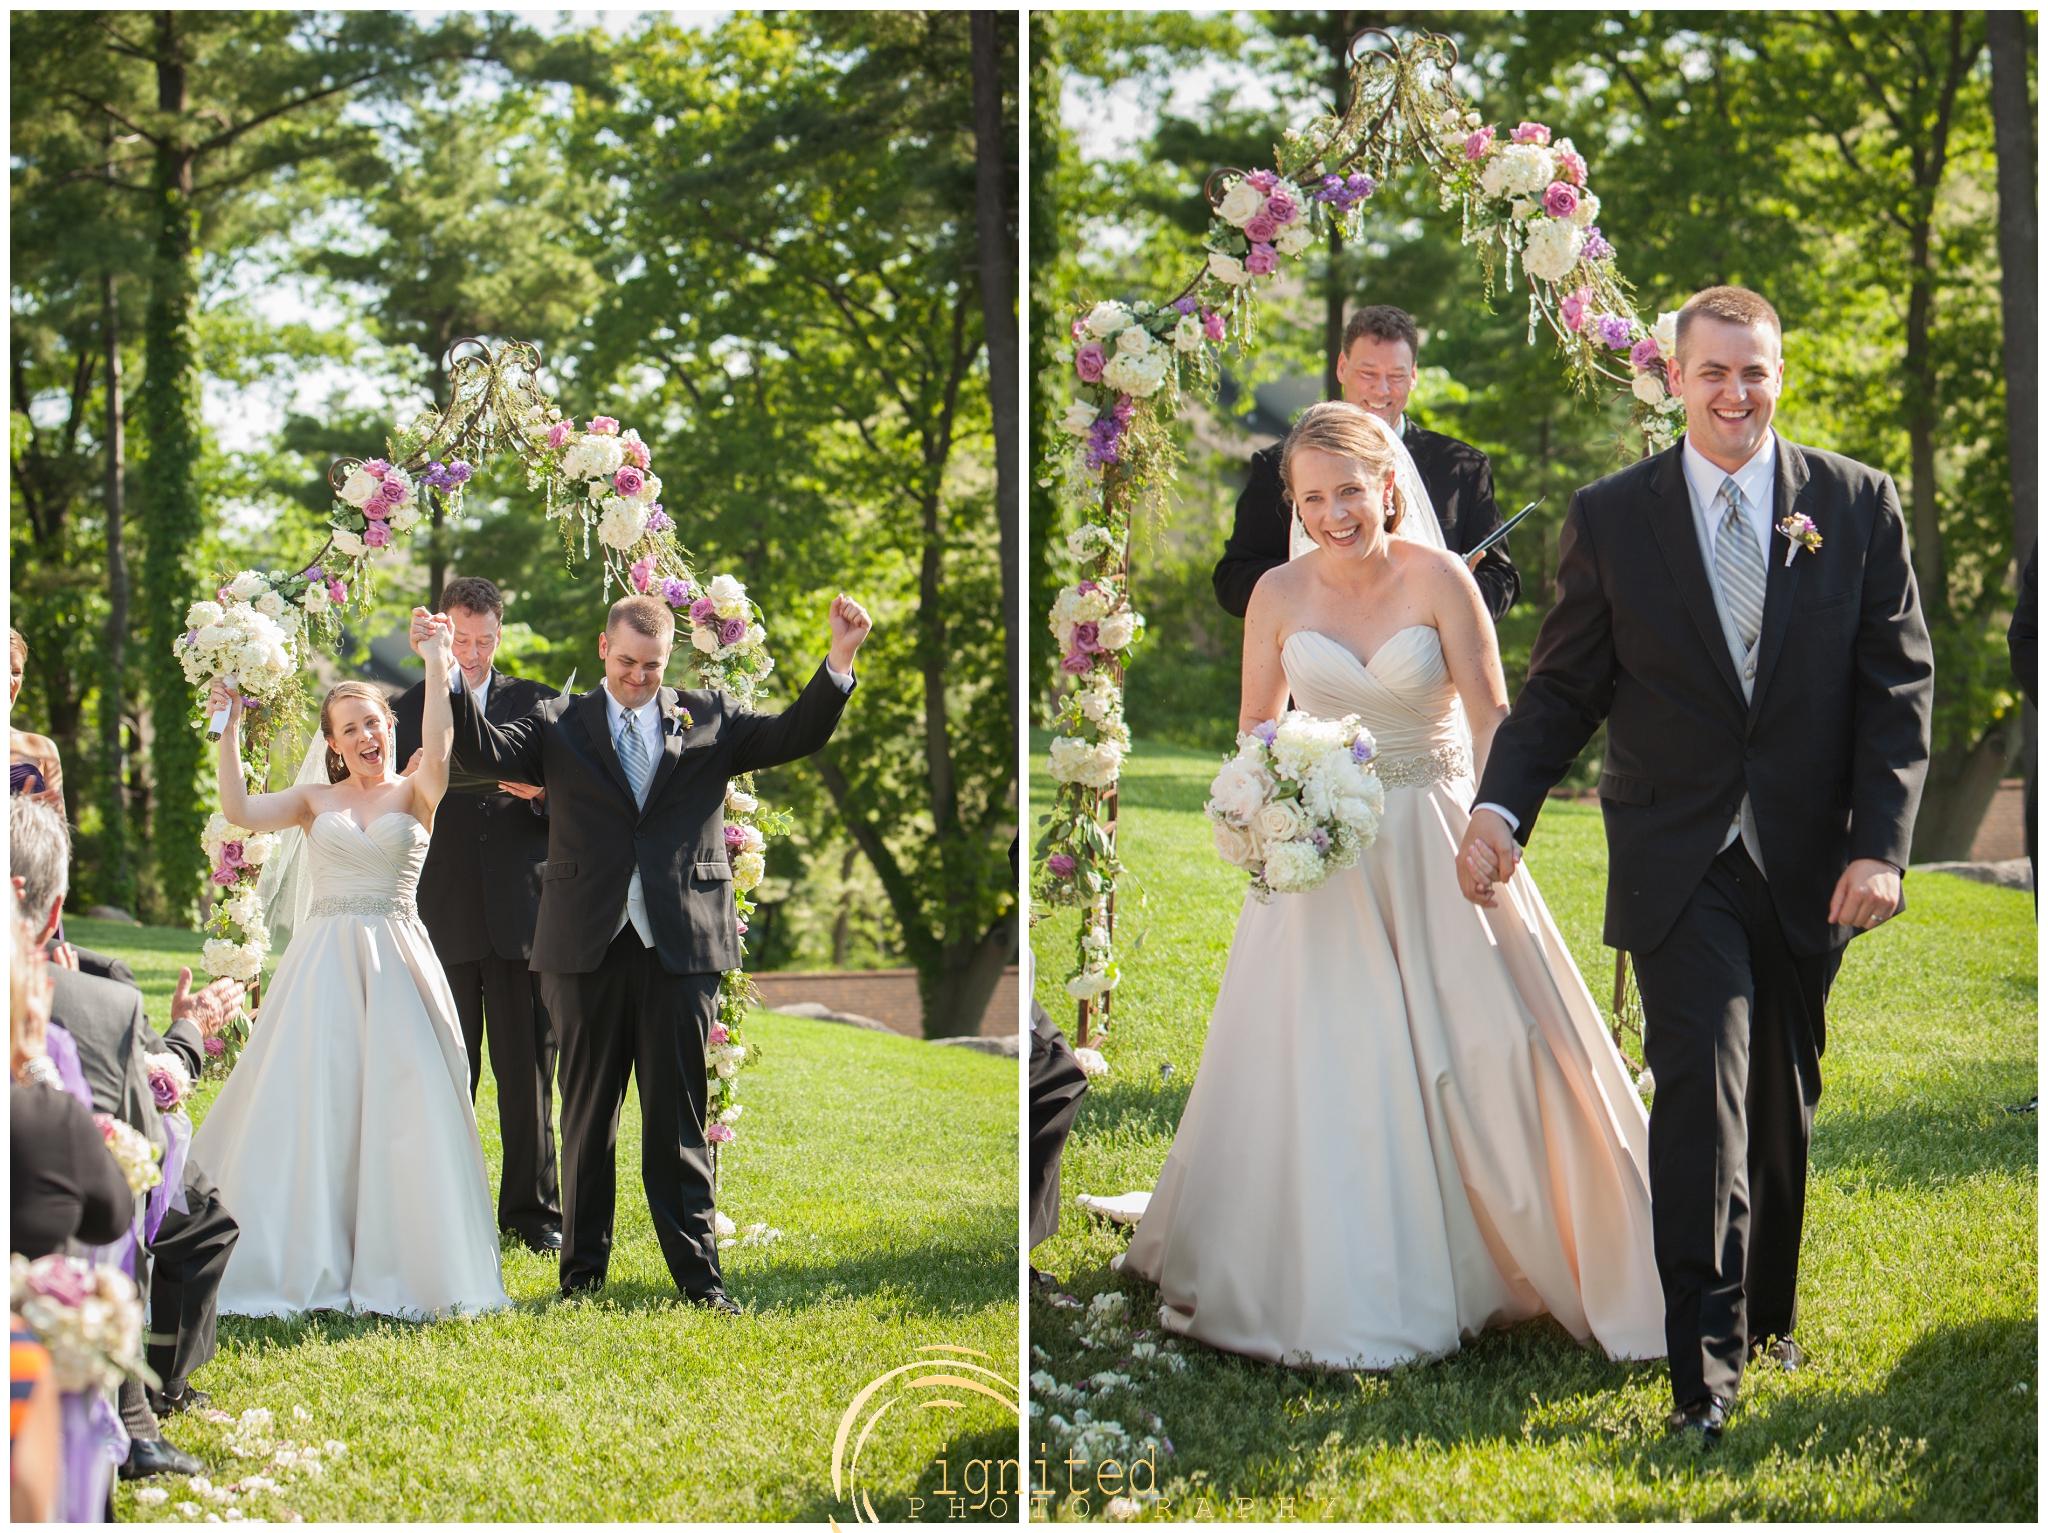 Borchardt Green Wedding_0011.jpg